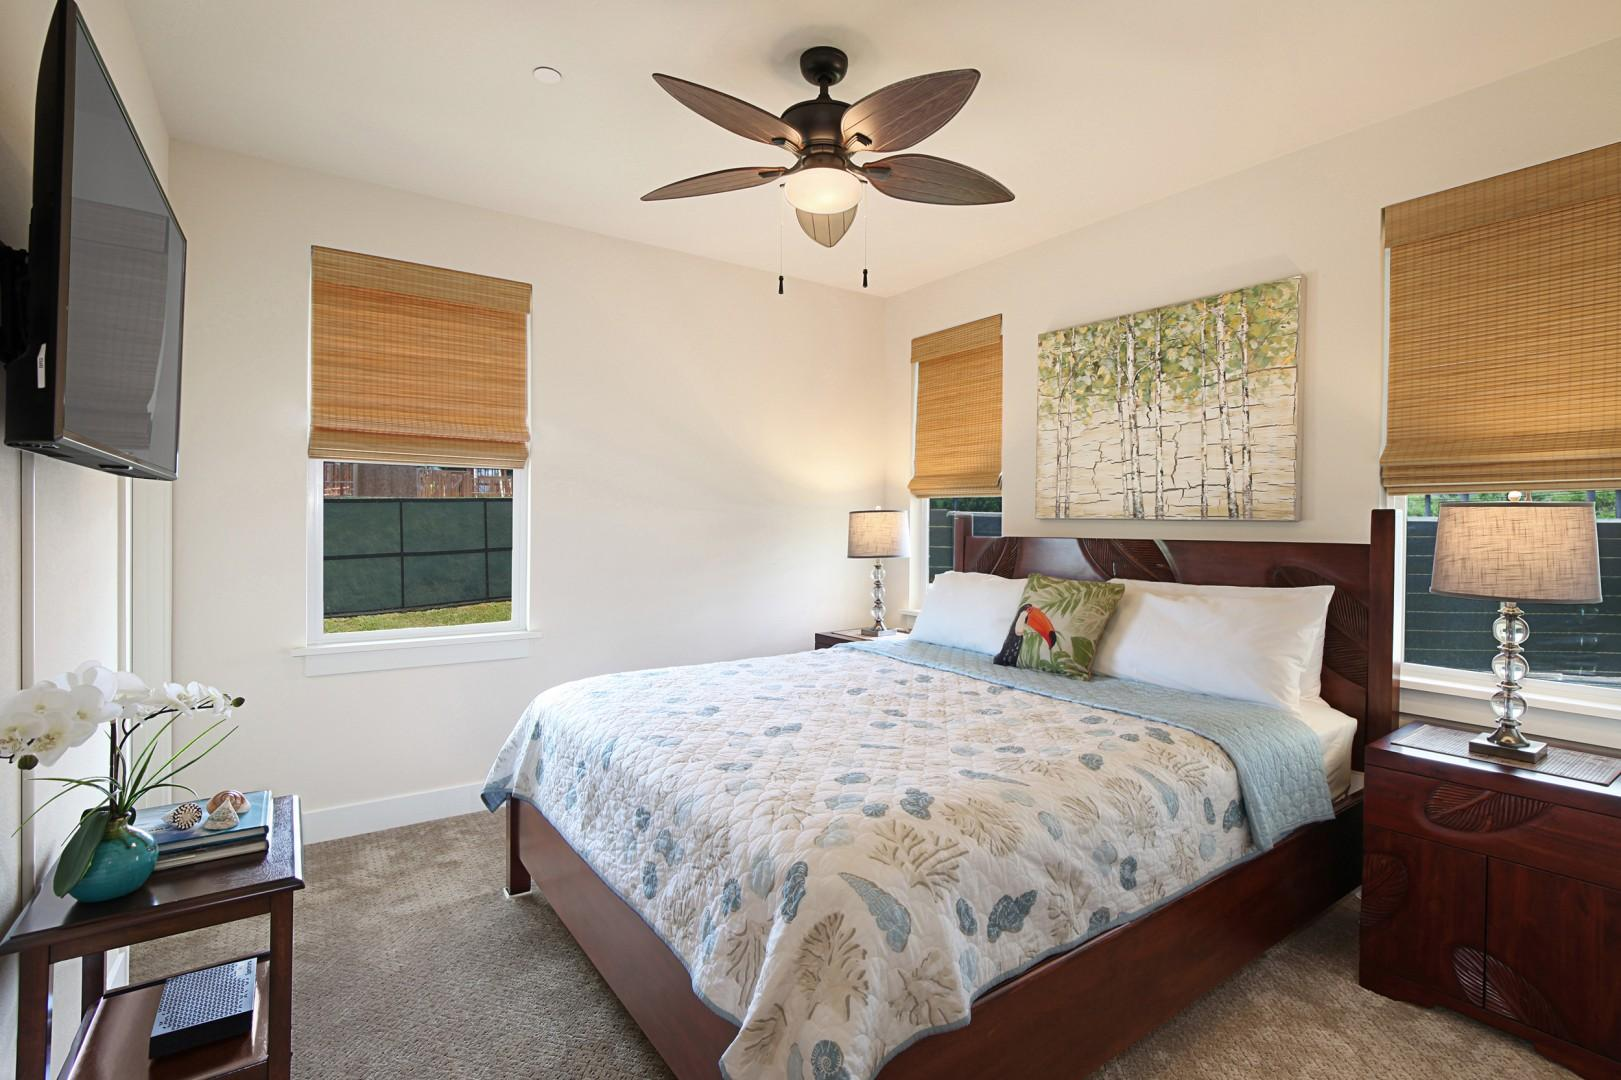 Downstairs en suite bedroom with TV